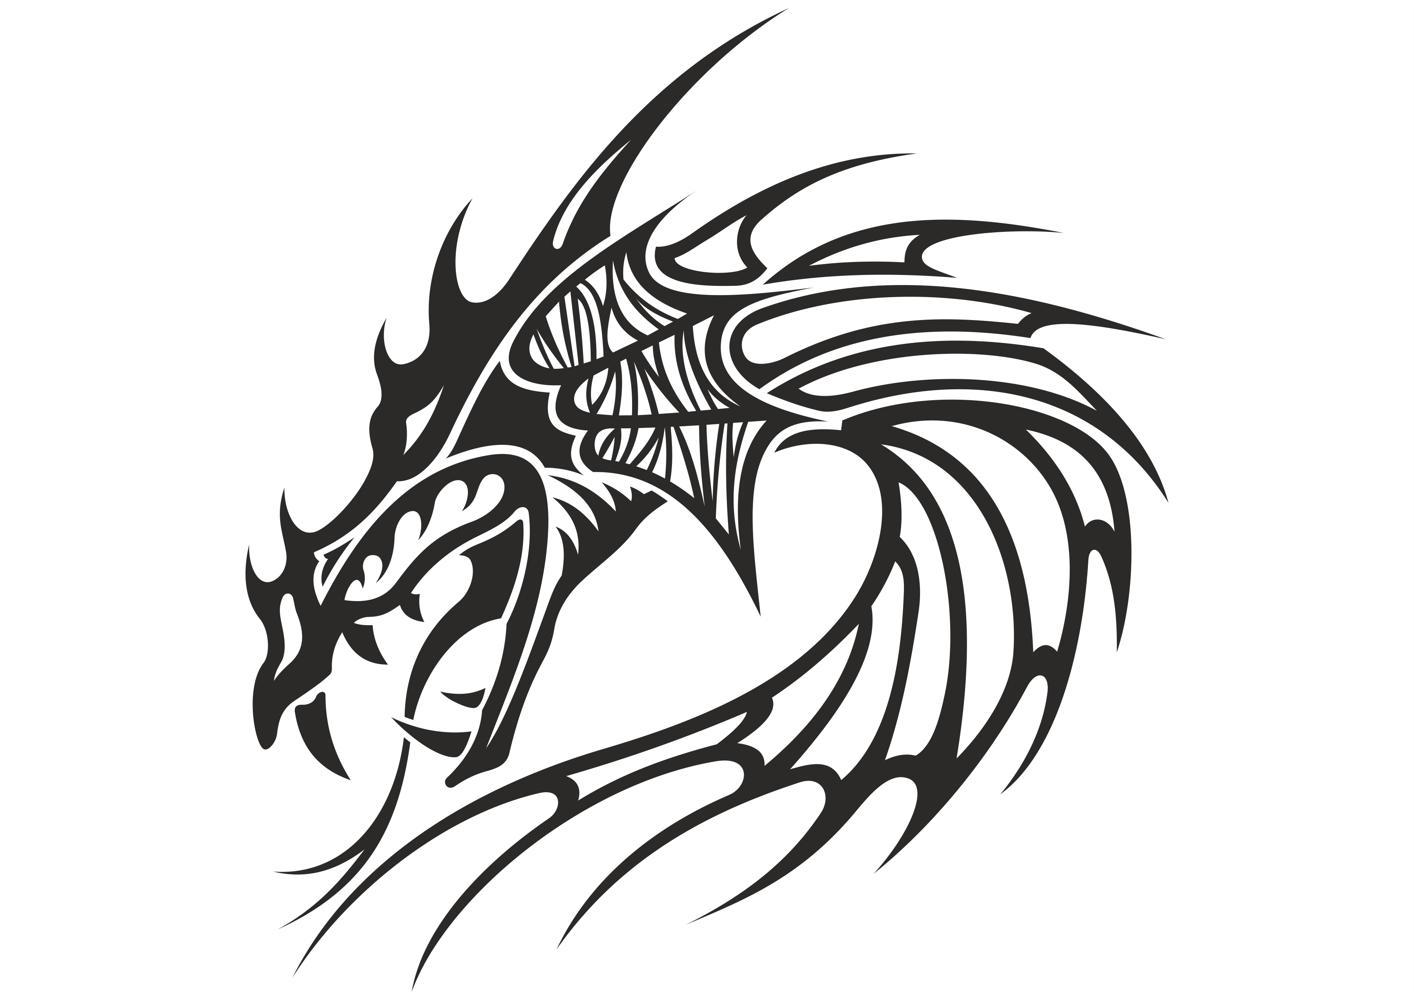 Chinese Dragon Head Tattoo Free CDR Vectors Art